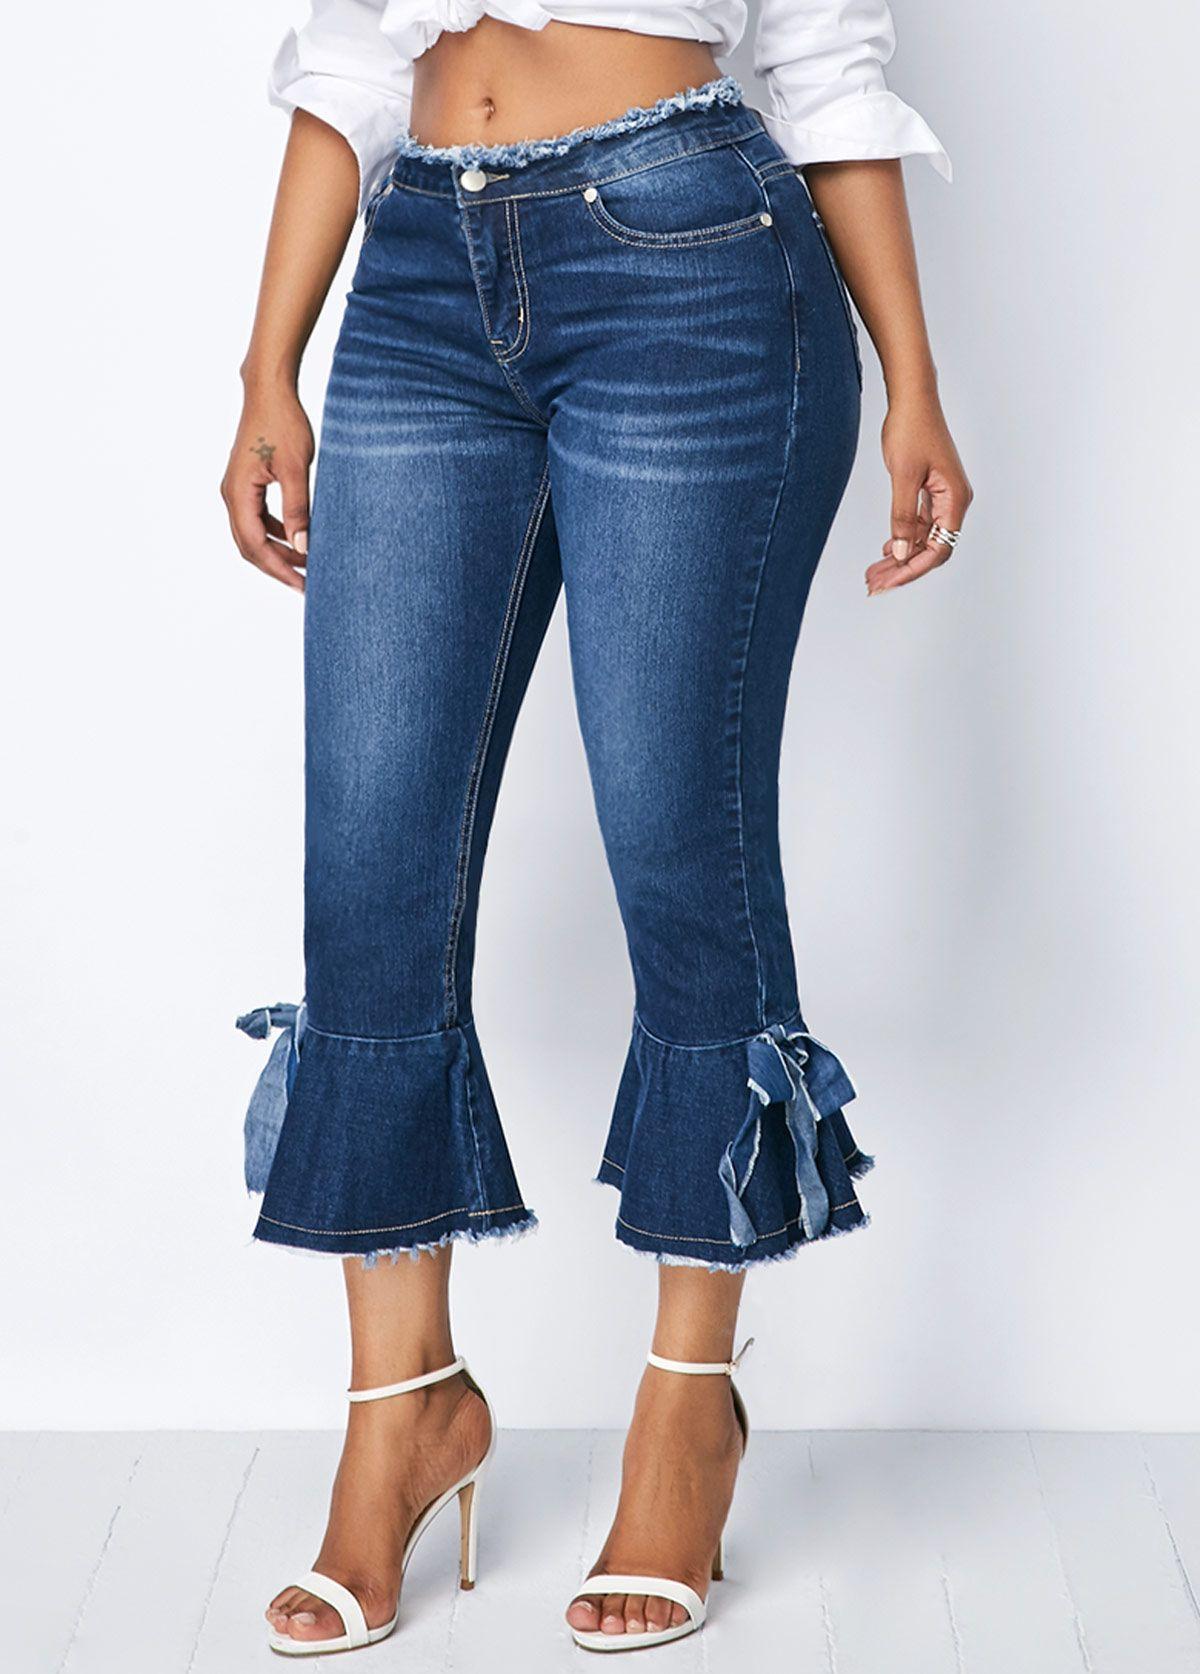 073077b10ec69 Frayed Hem Zipper Fly Bowknot Detail Denim Pants | Rotita.com - USD $34.88